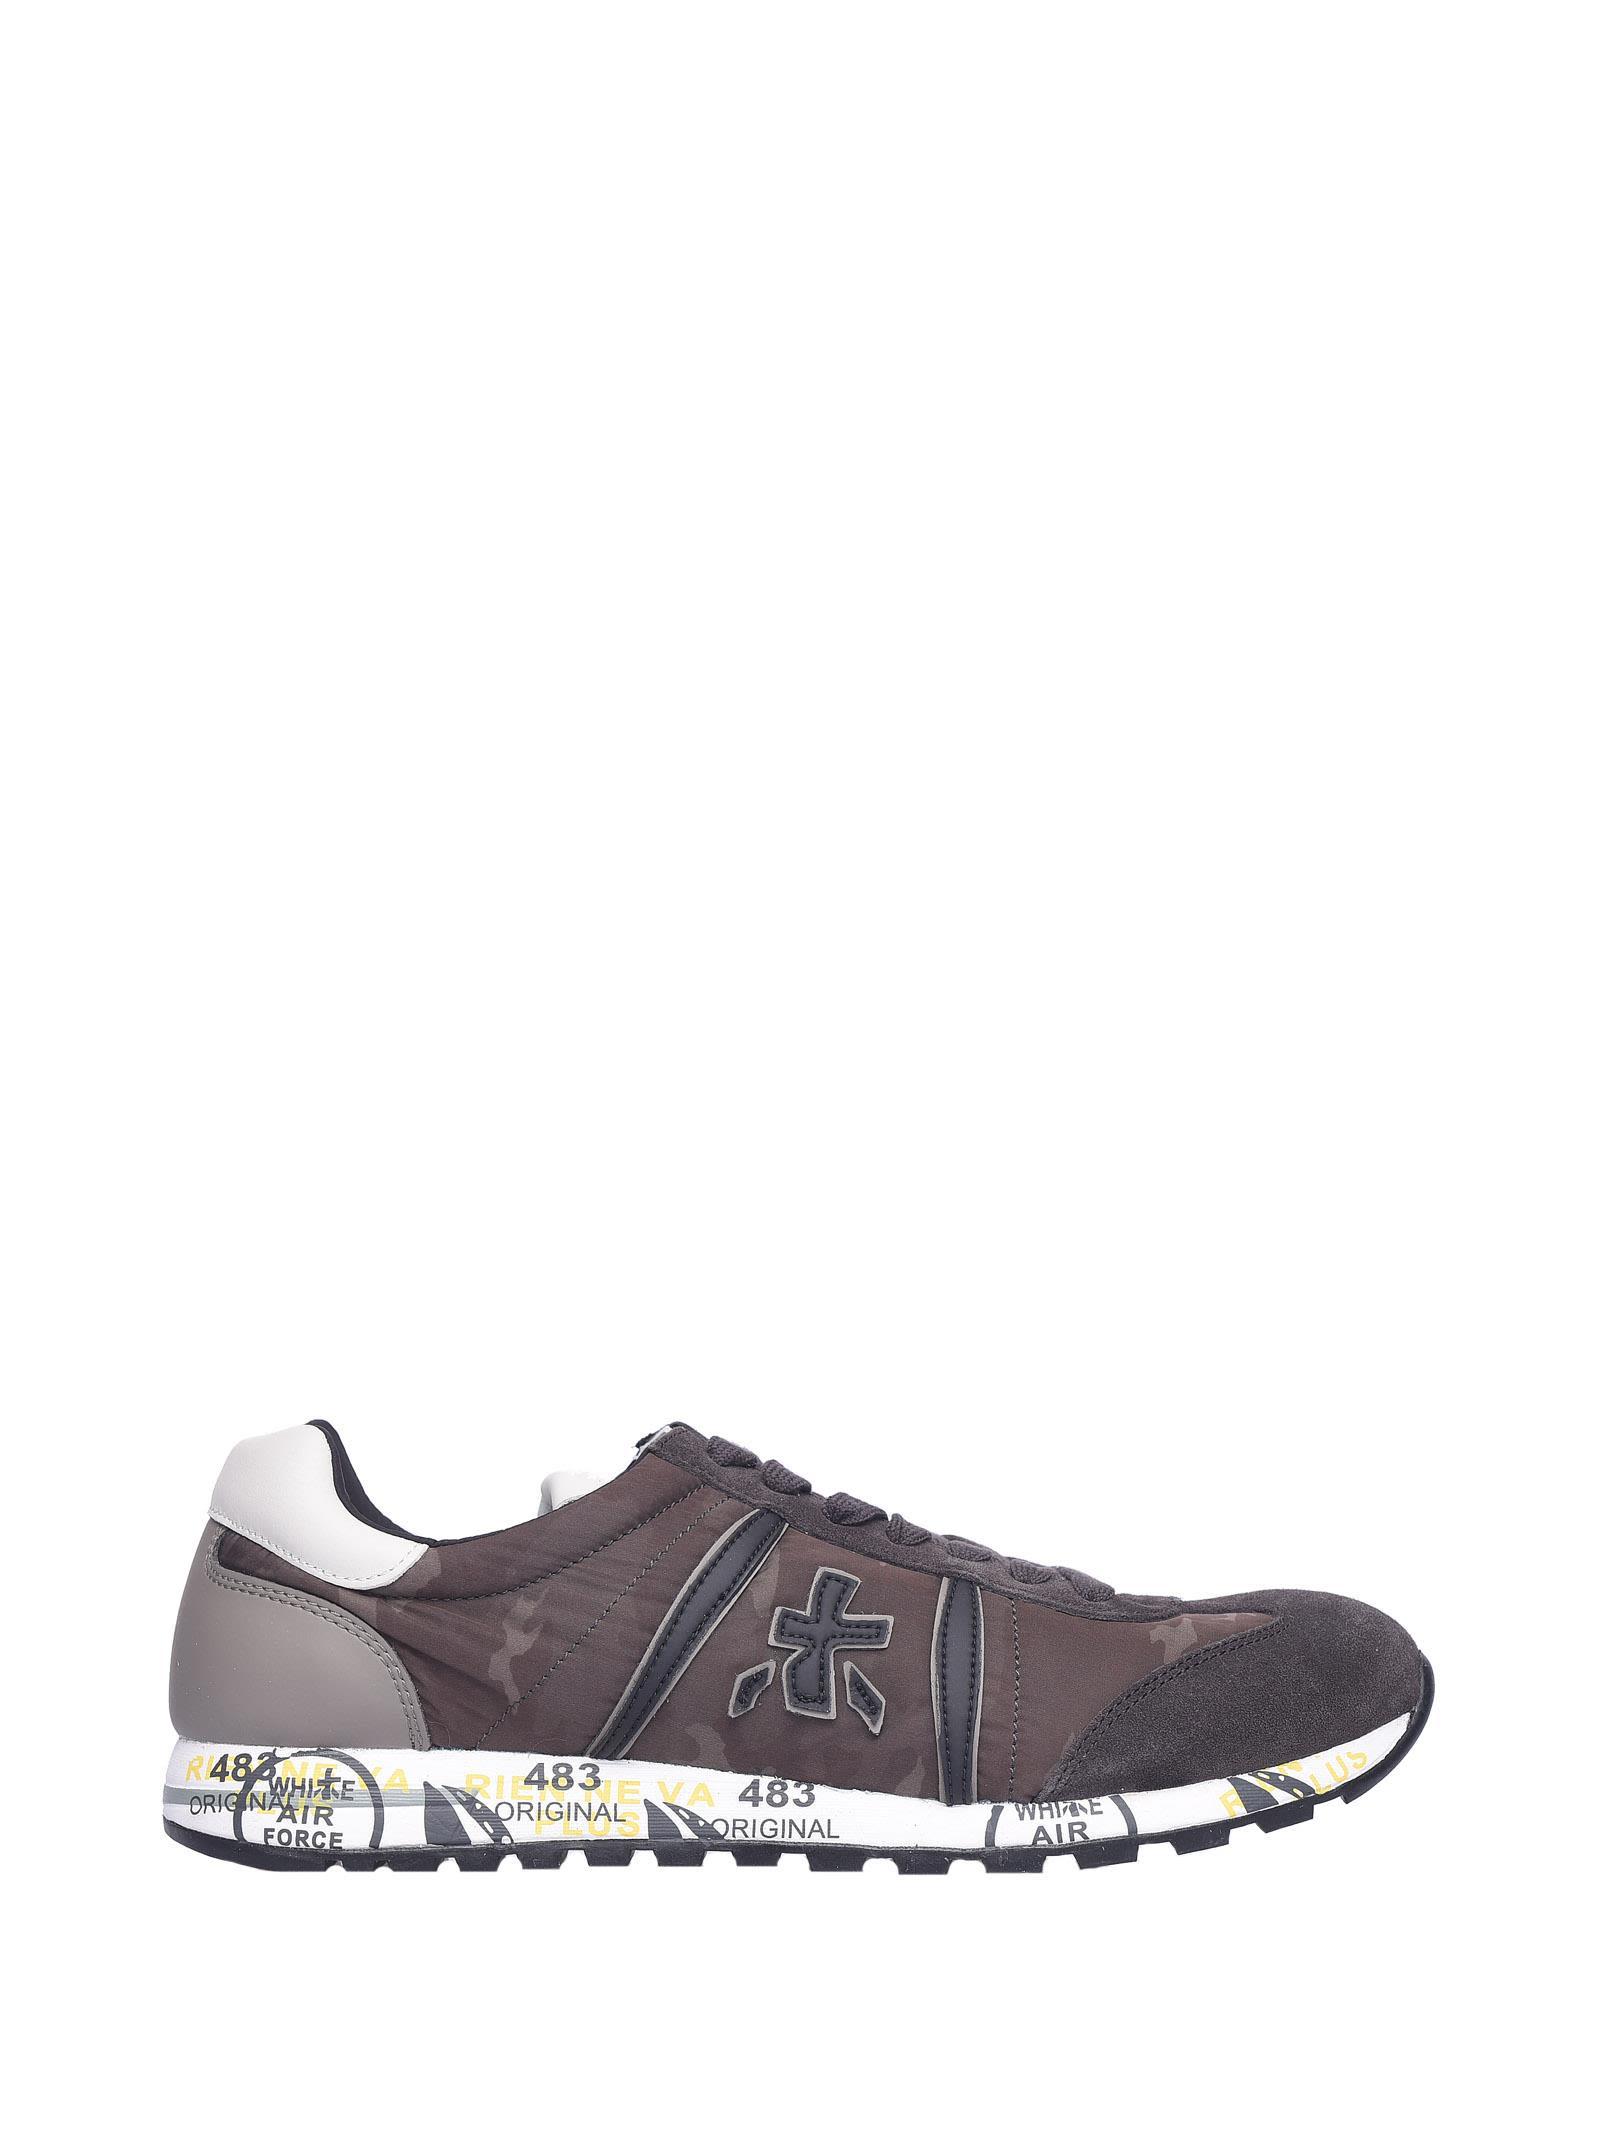 Premiata Lucy 2459 Sneakers